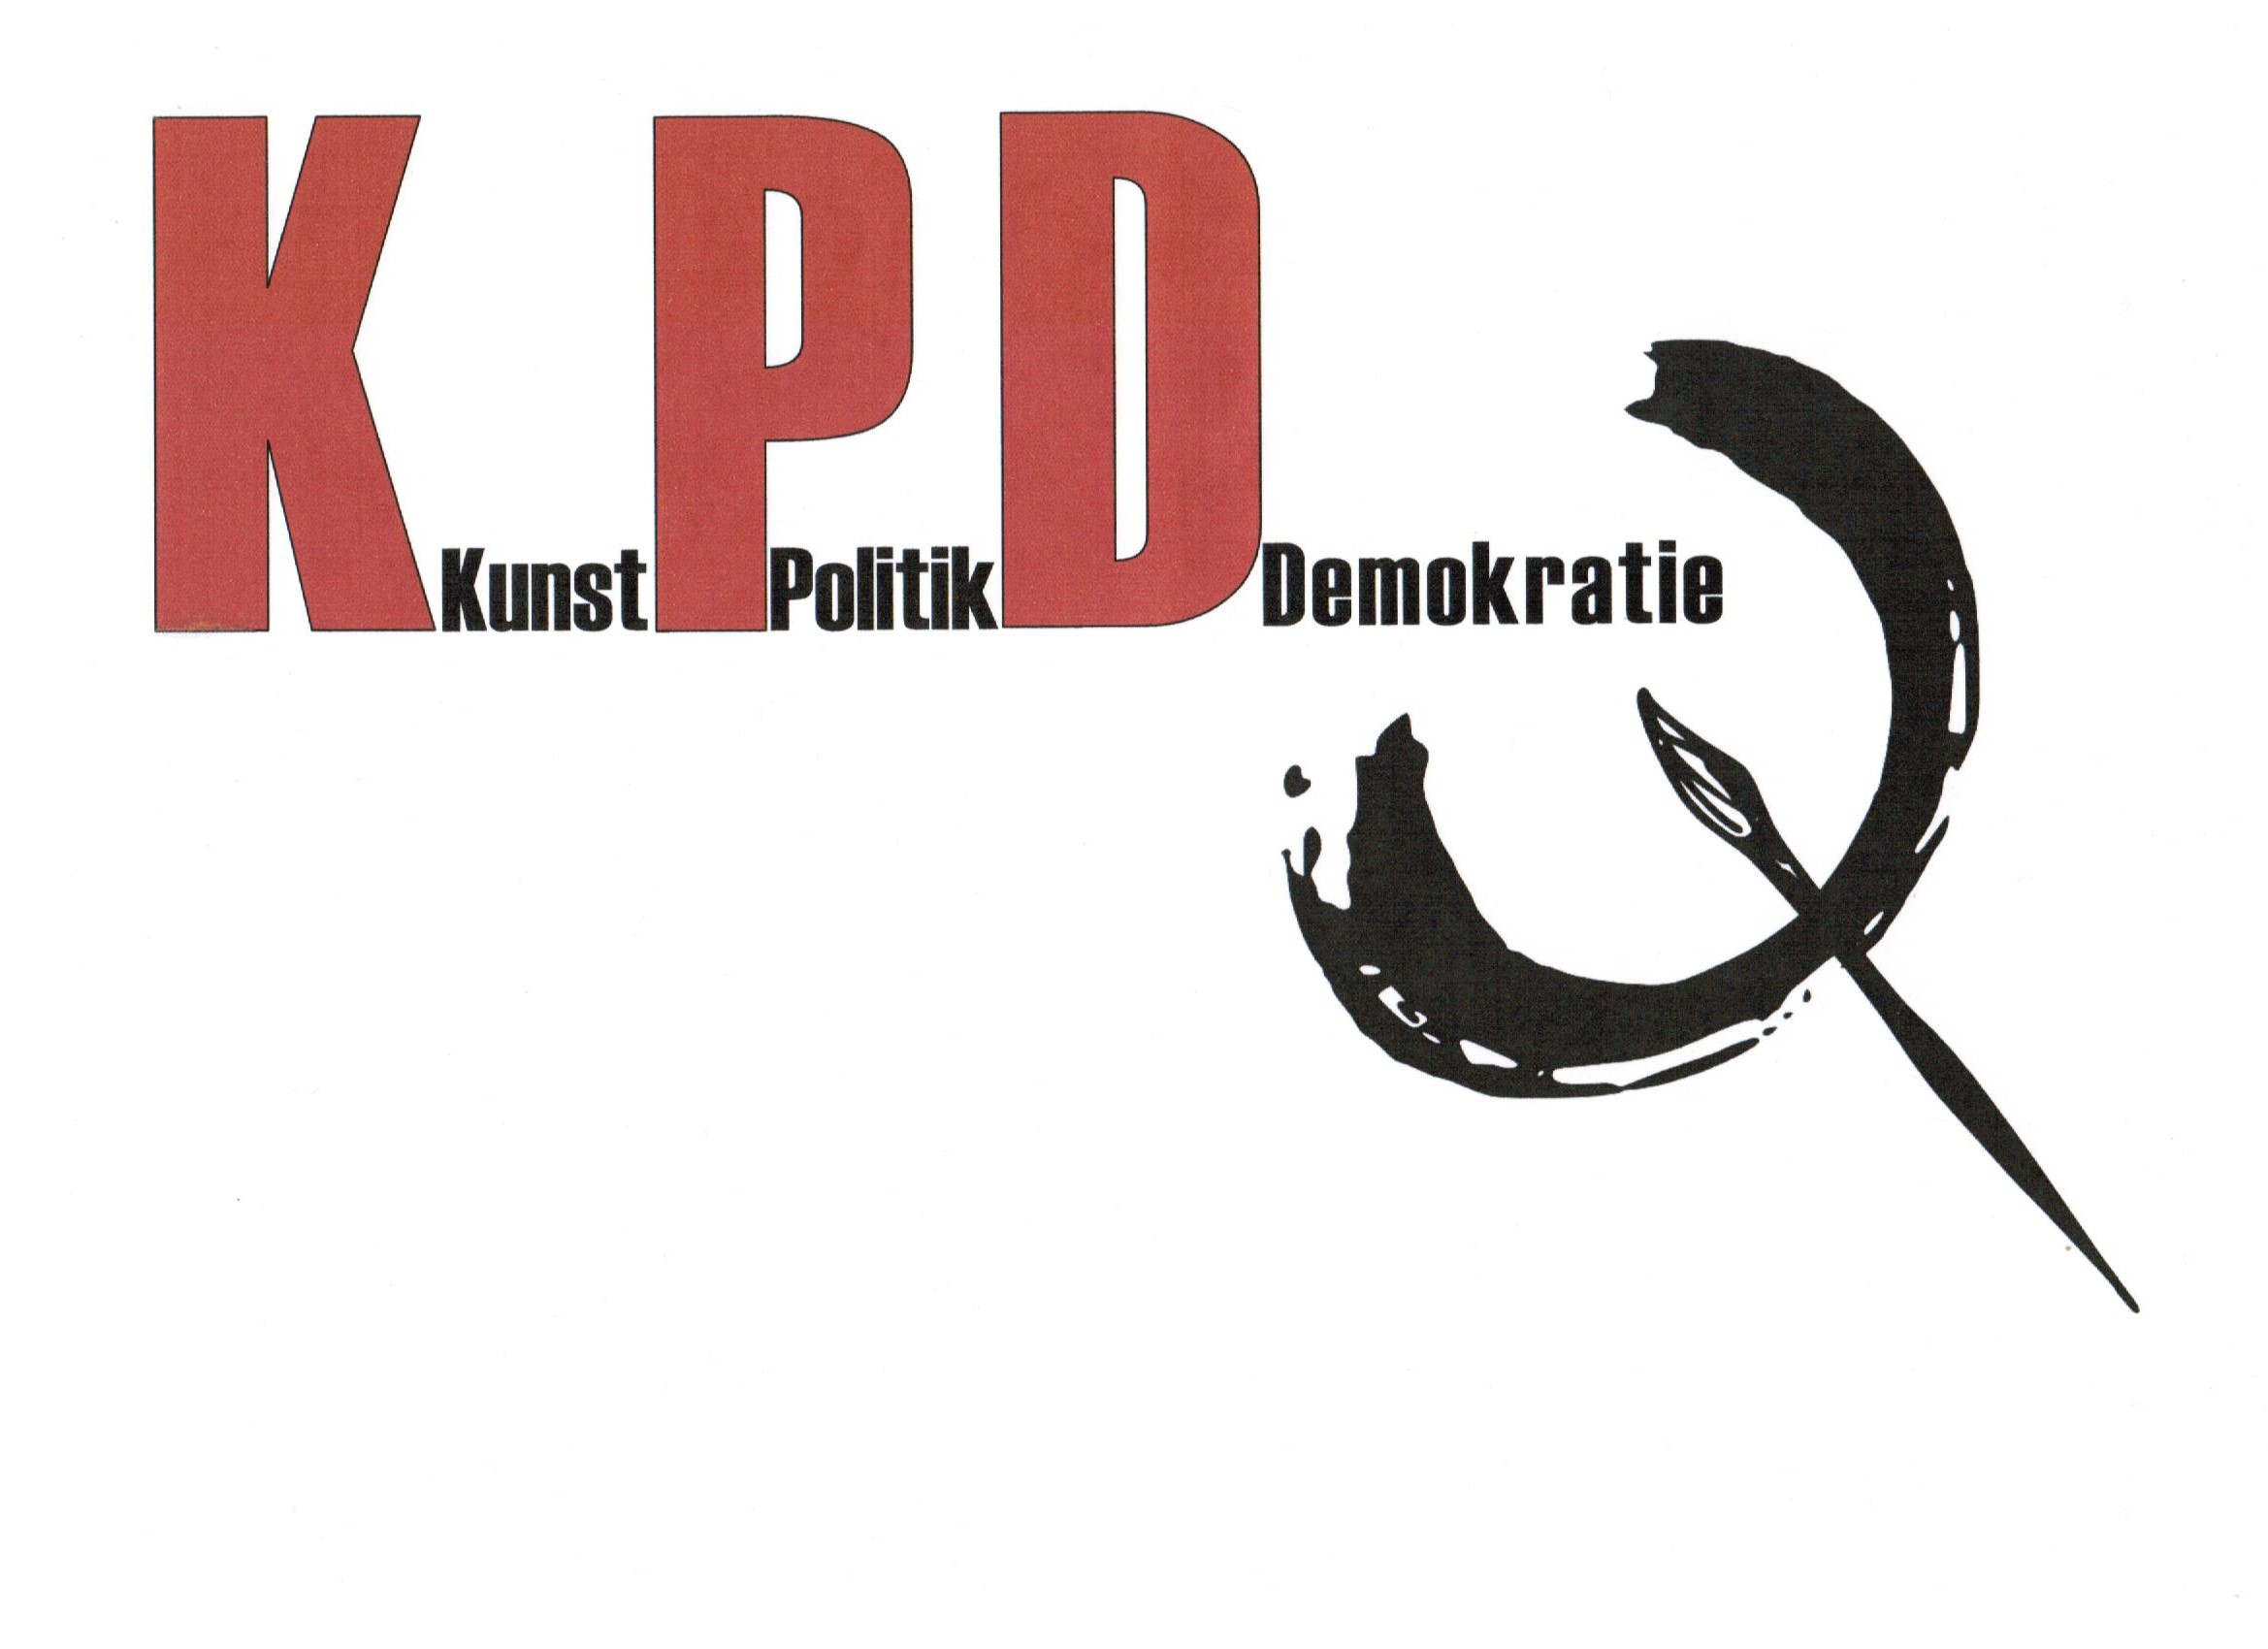 K-P-D Kunst-Politik-Demokratie